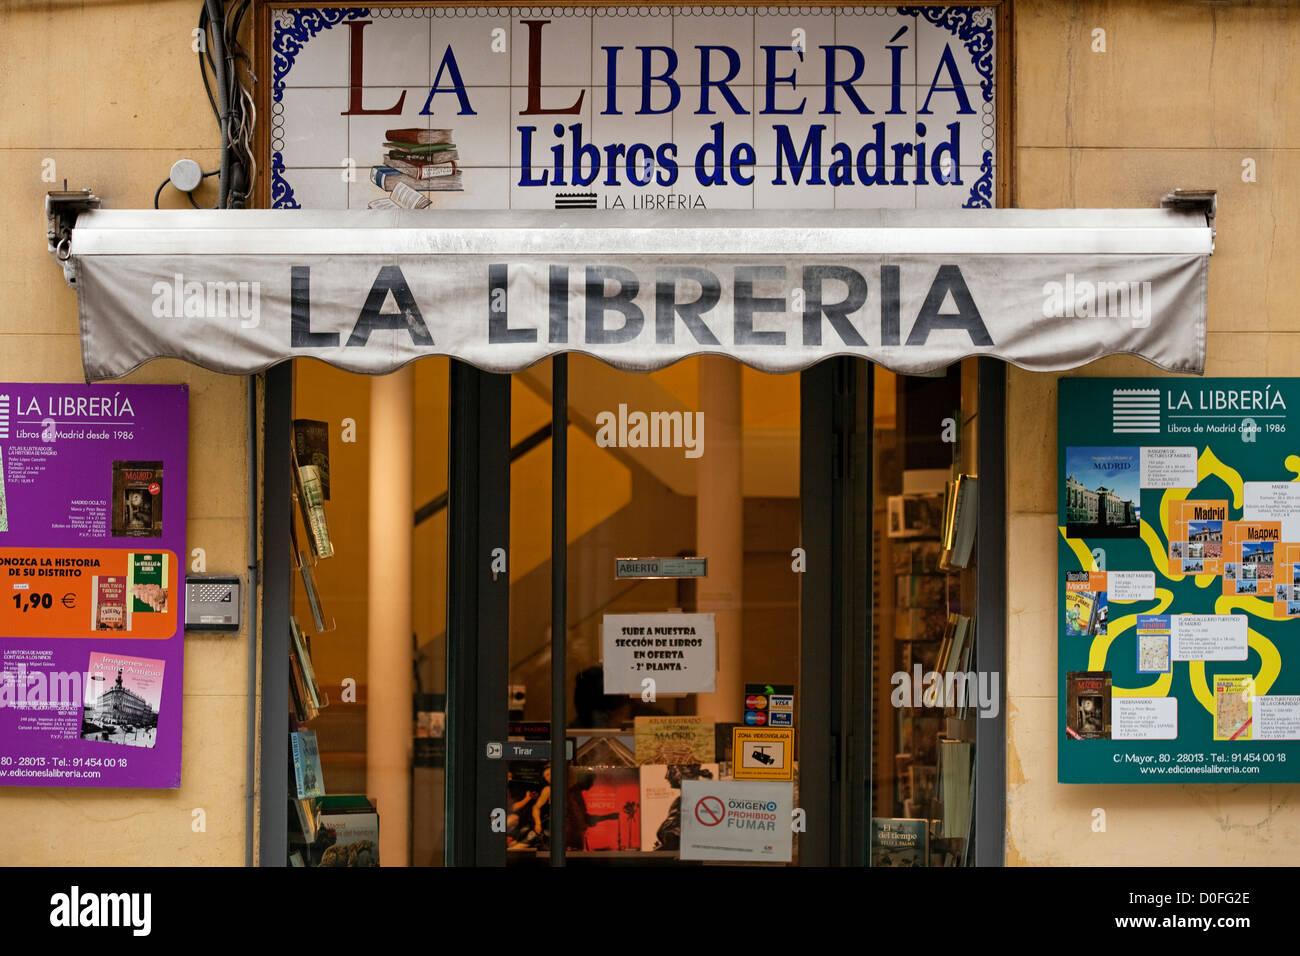 Libreria in Madrid Spagna Libreria en Madrid España Immagini Stock